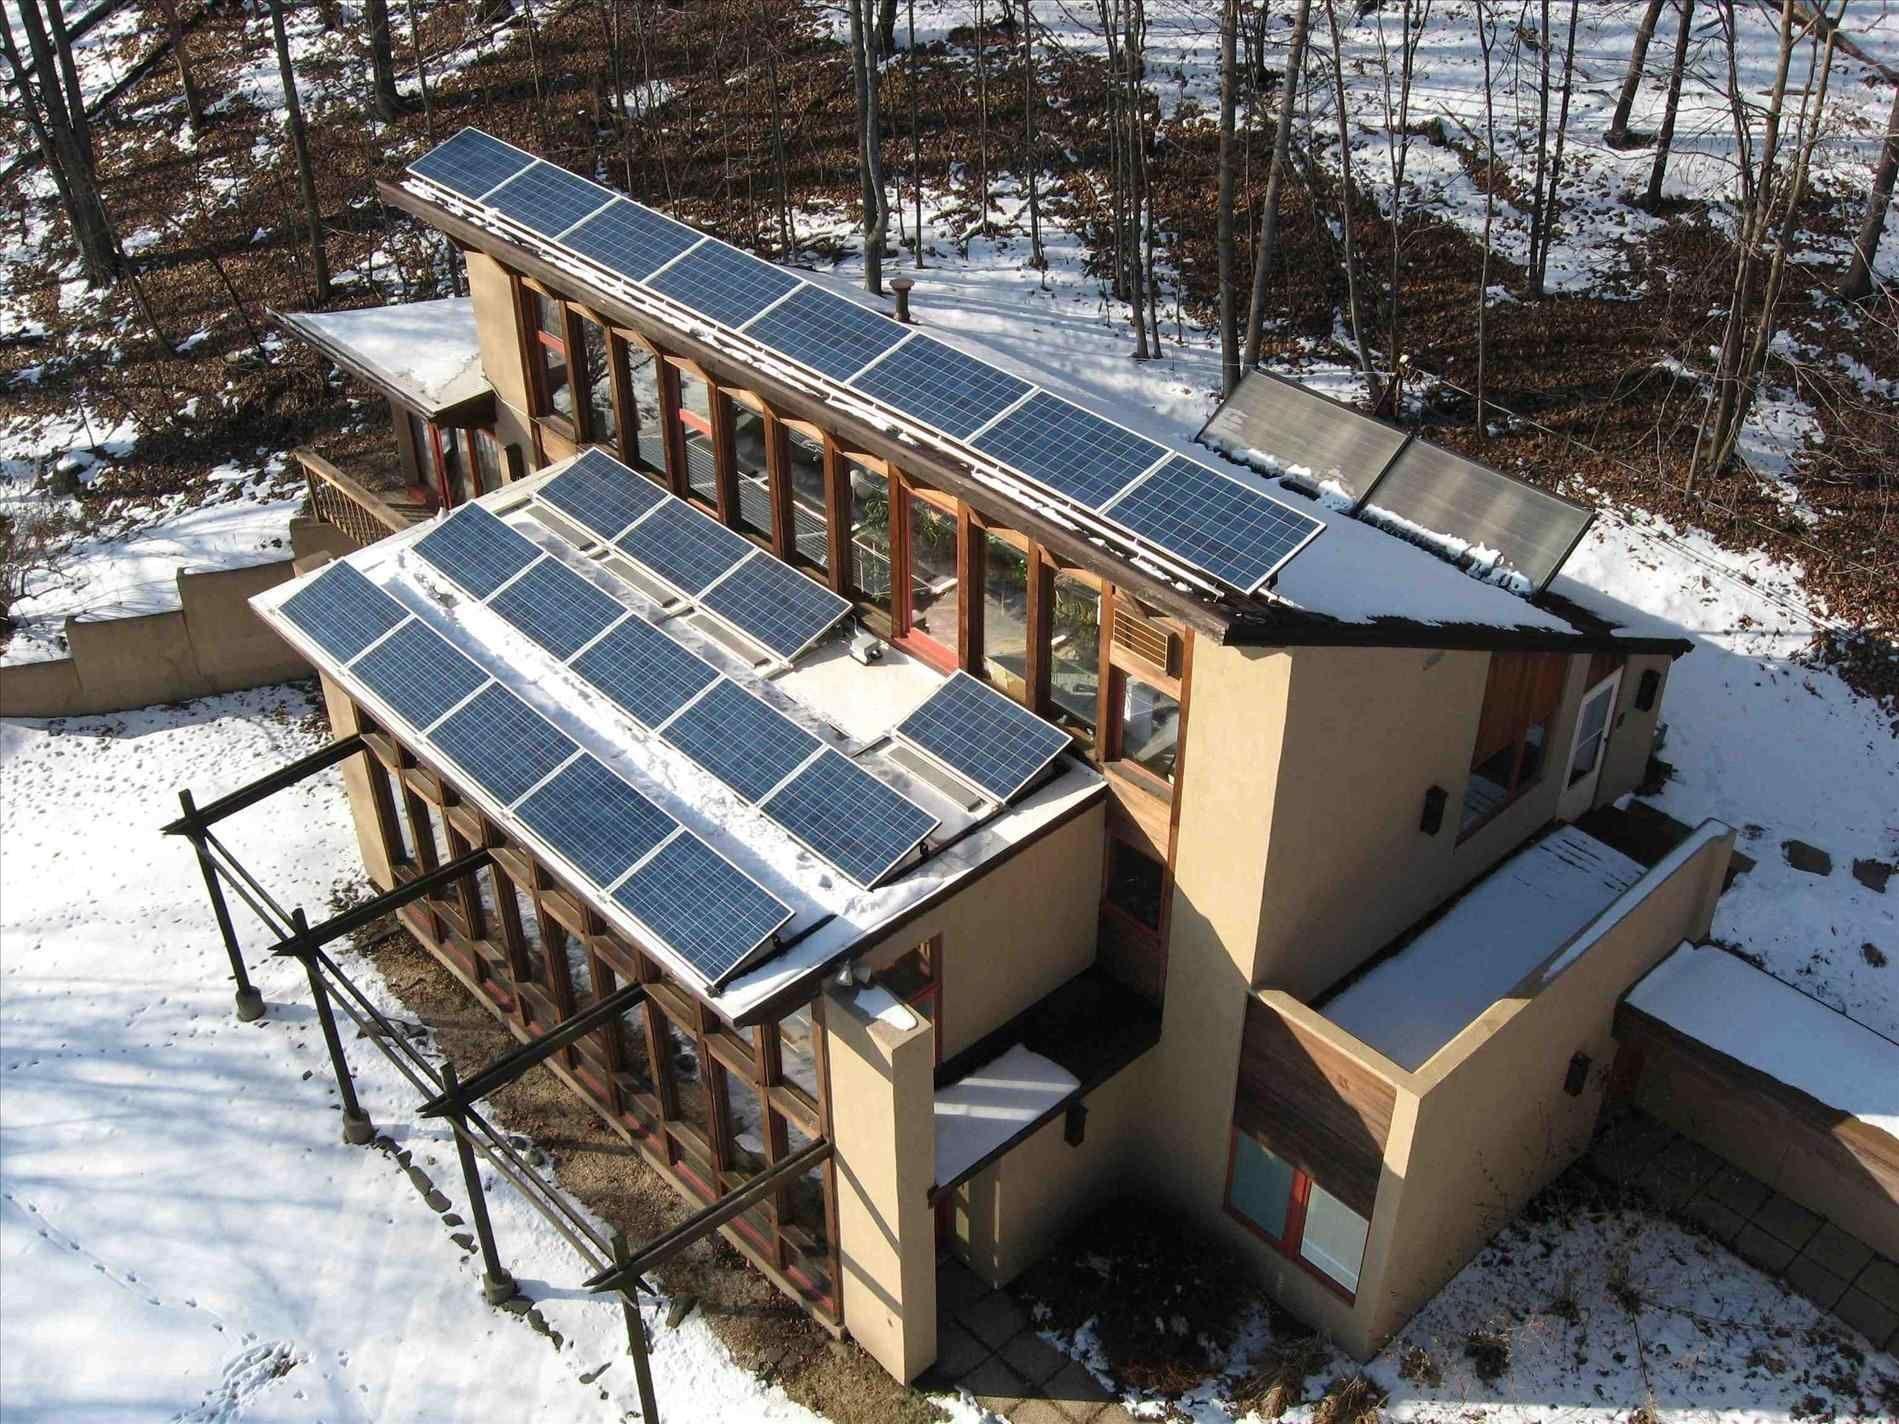 Passive Solar Roof Design Passive Solar Homes Passive Solar House Plans Solar House Plans